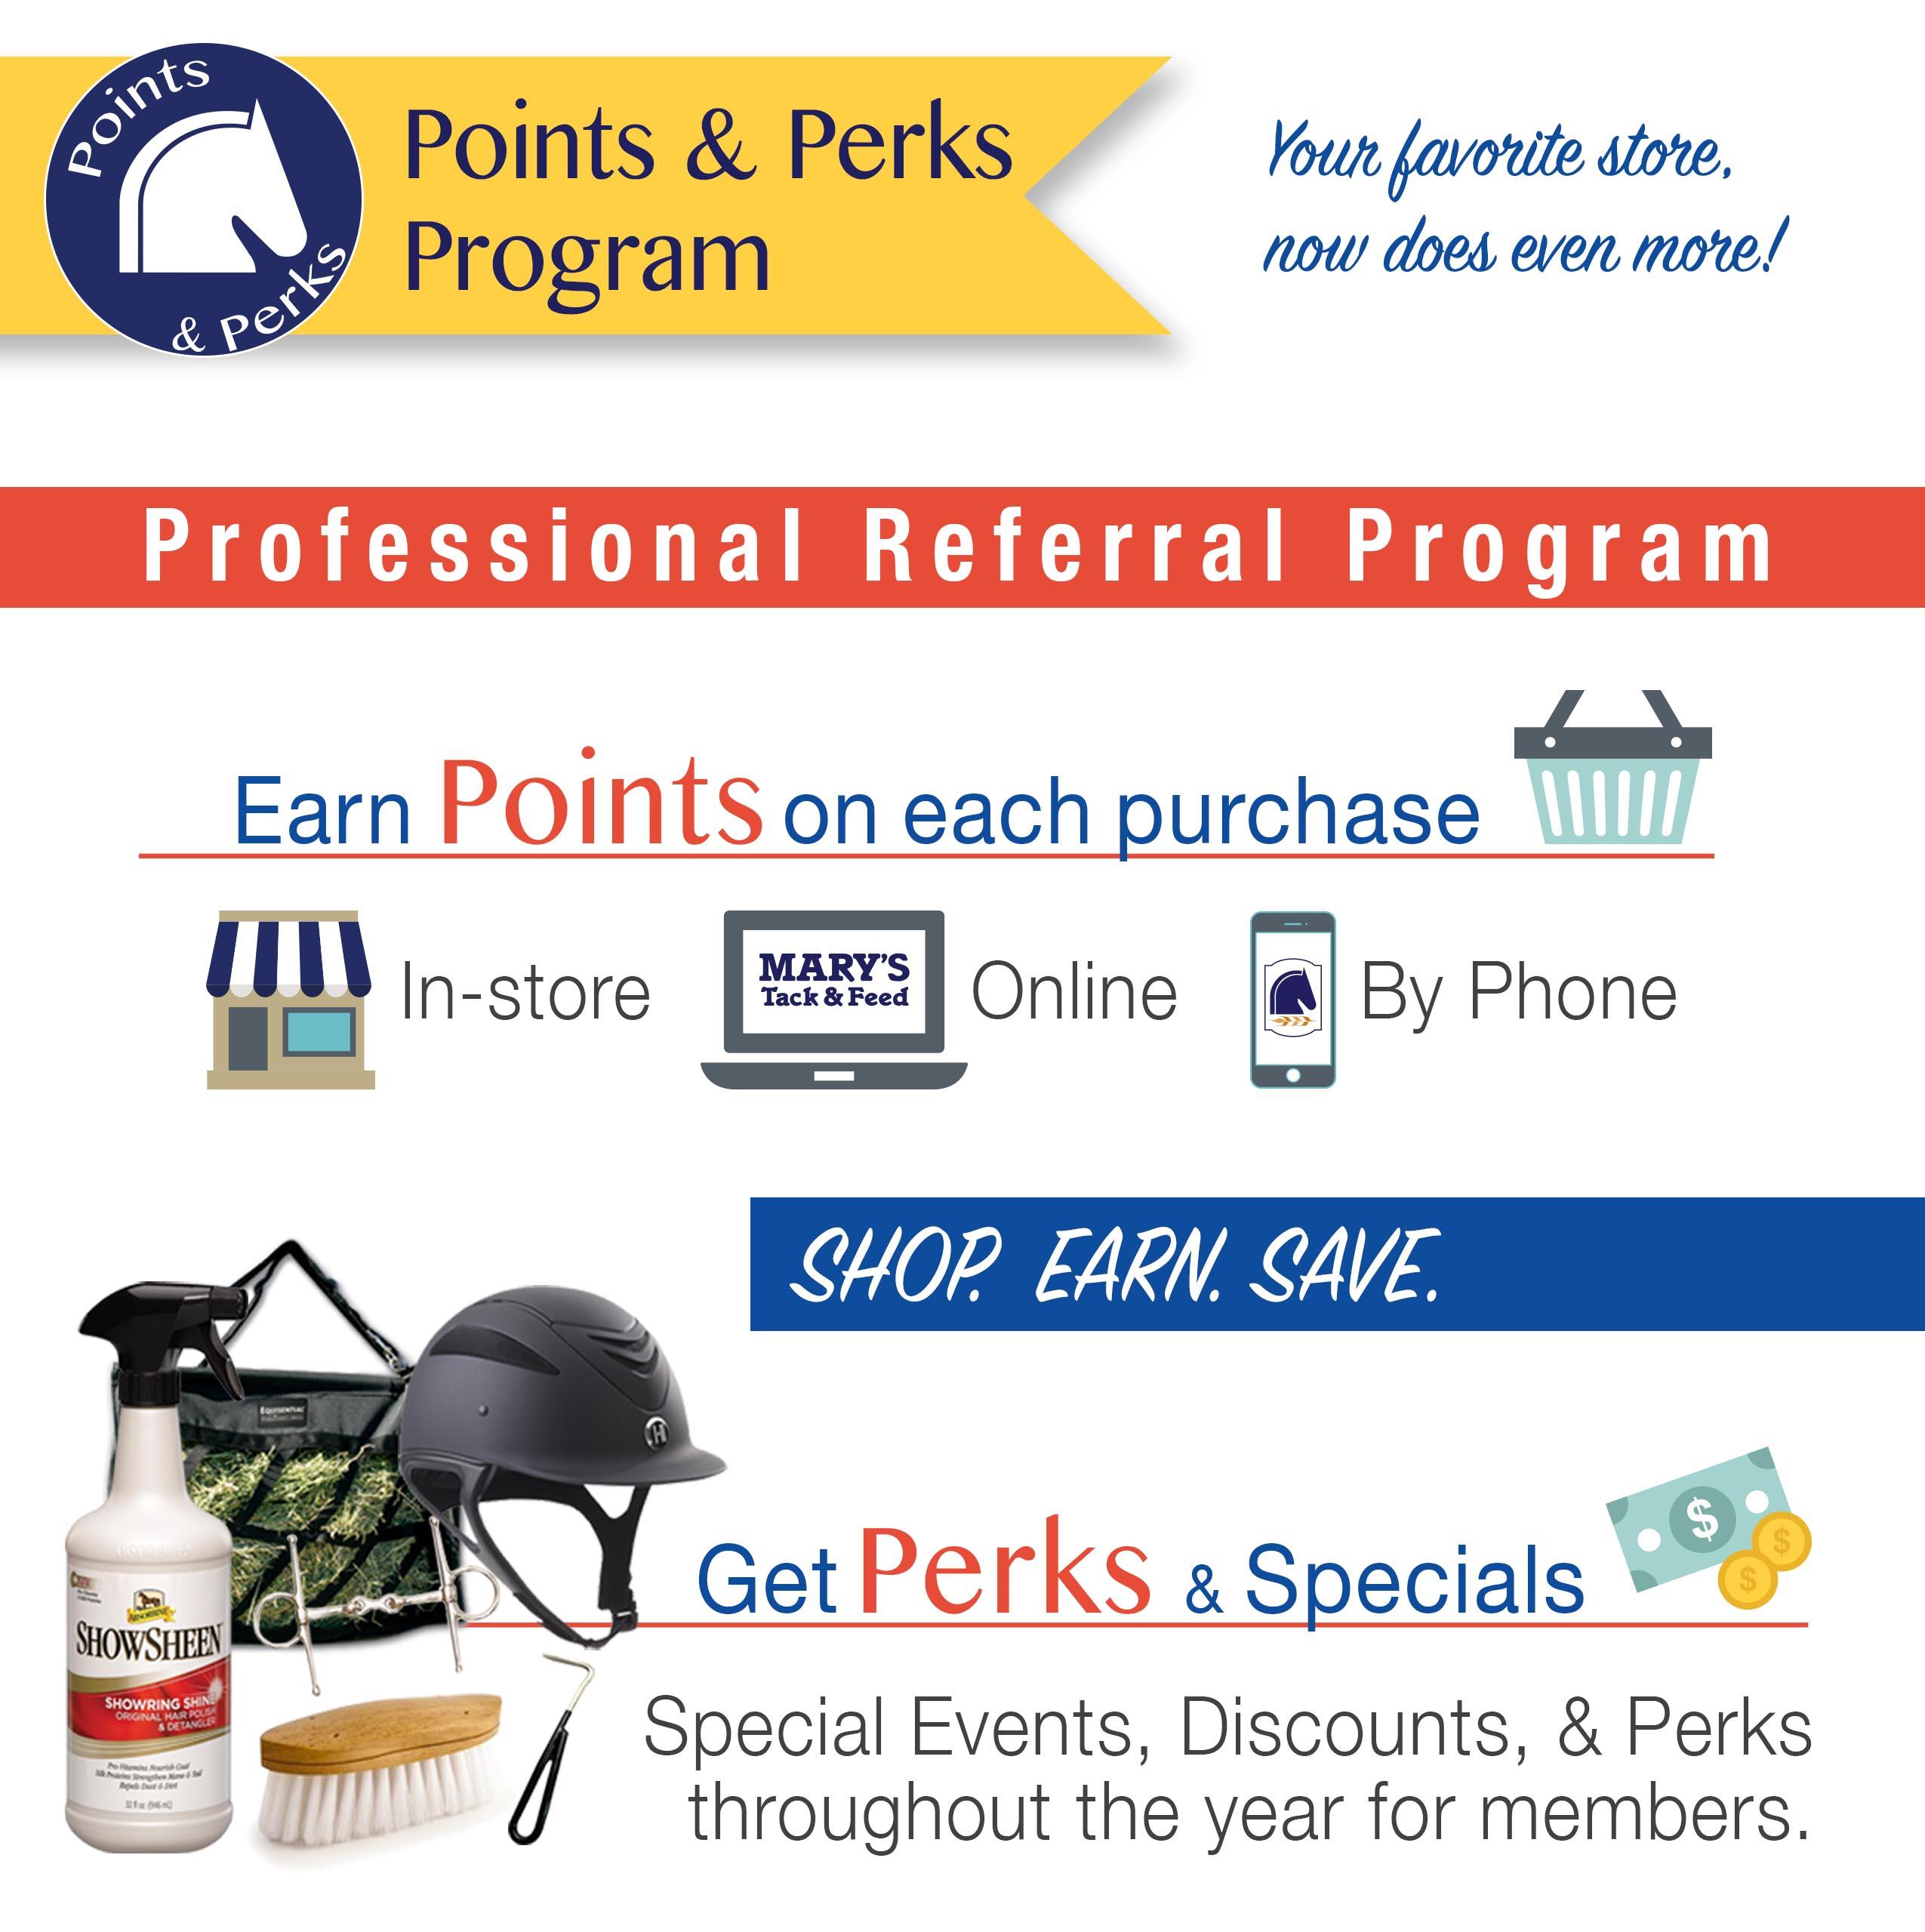 Professional Referral Program